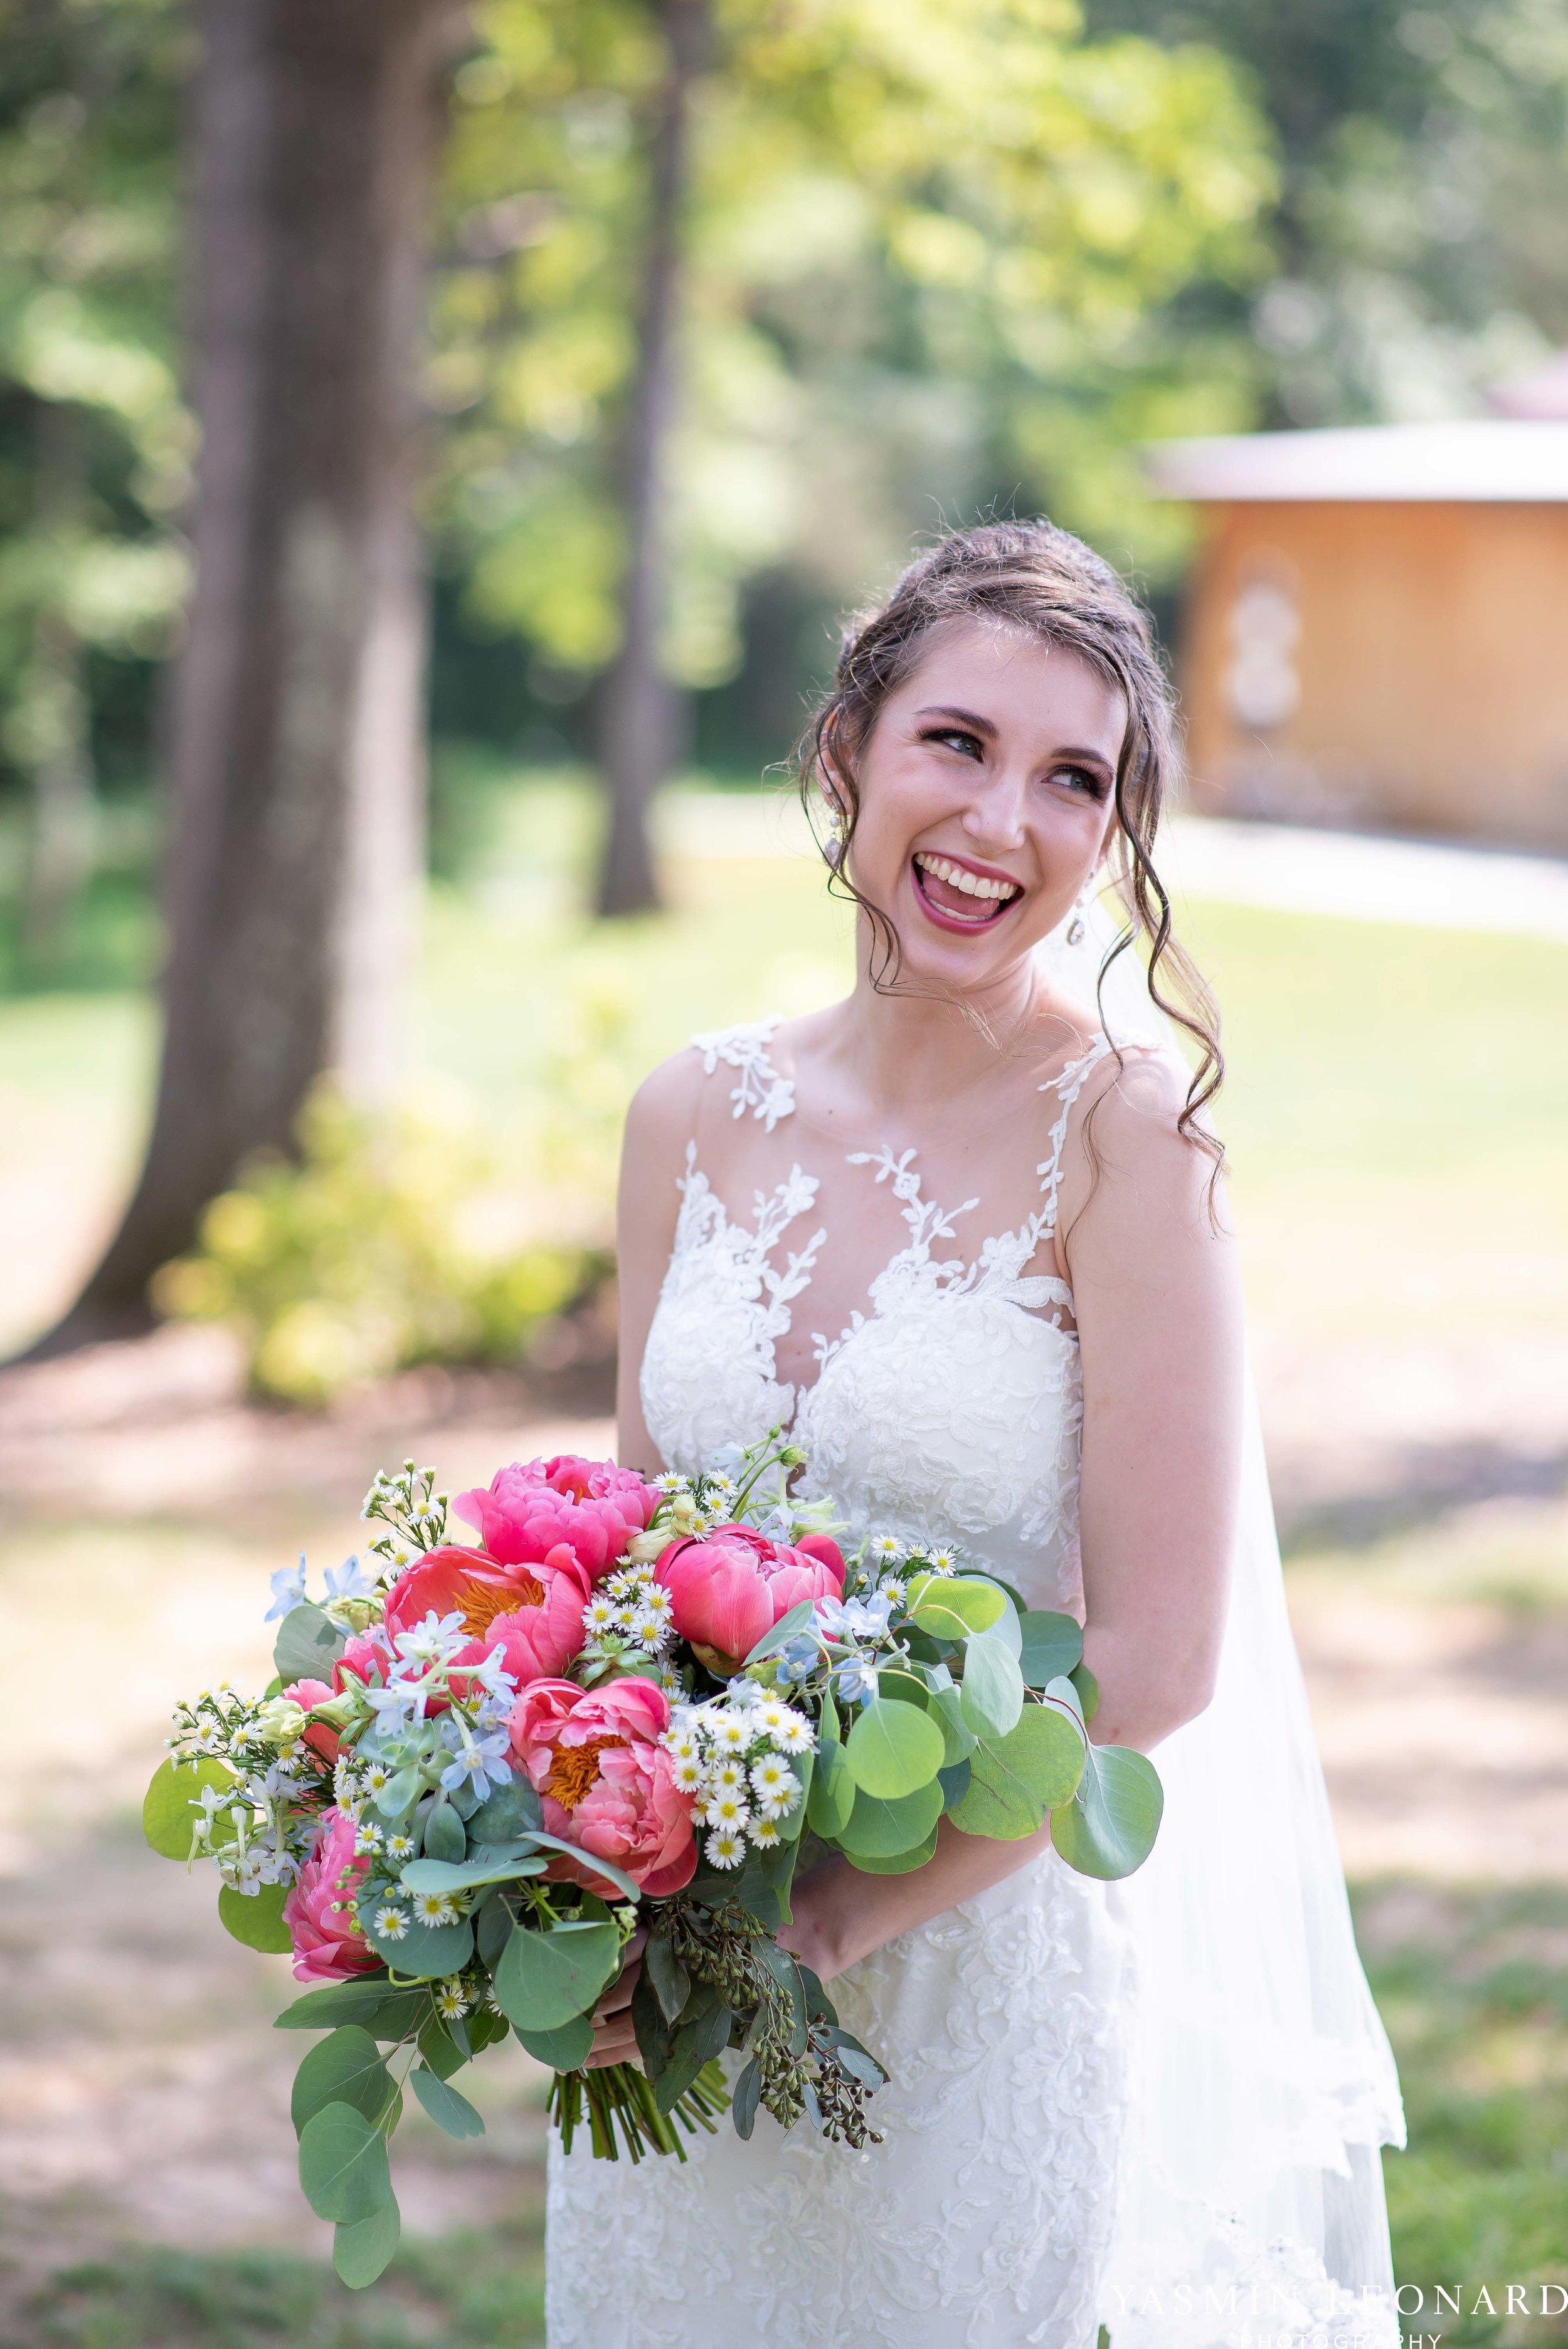 Old Homeplace Vineyard - NC Weddings - Outdoor Summer Weddings - Peony Boutique - Vineyard Wedding - NC Photographer - Yasmin Leonard Photography-14.jpg